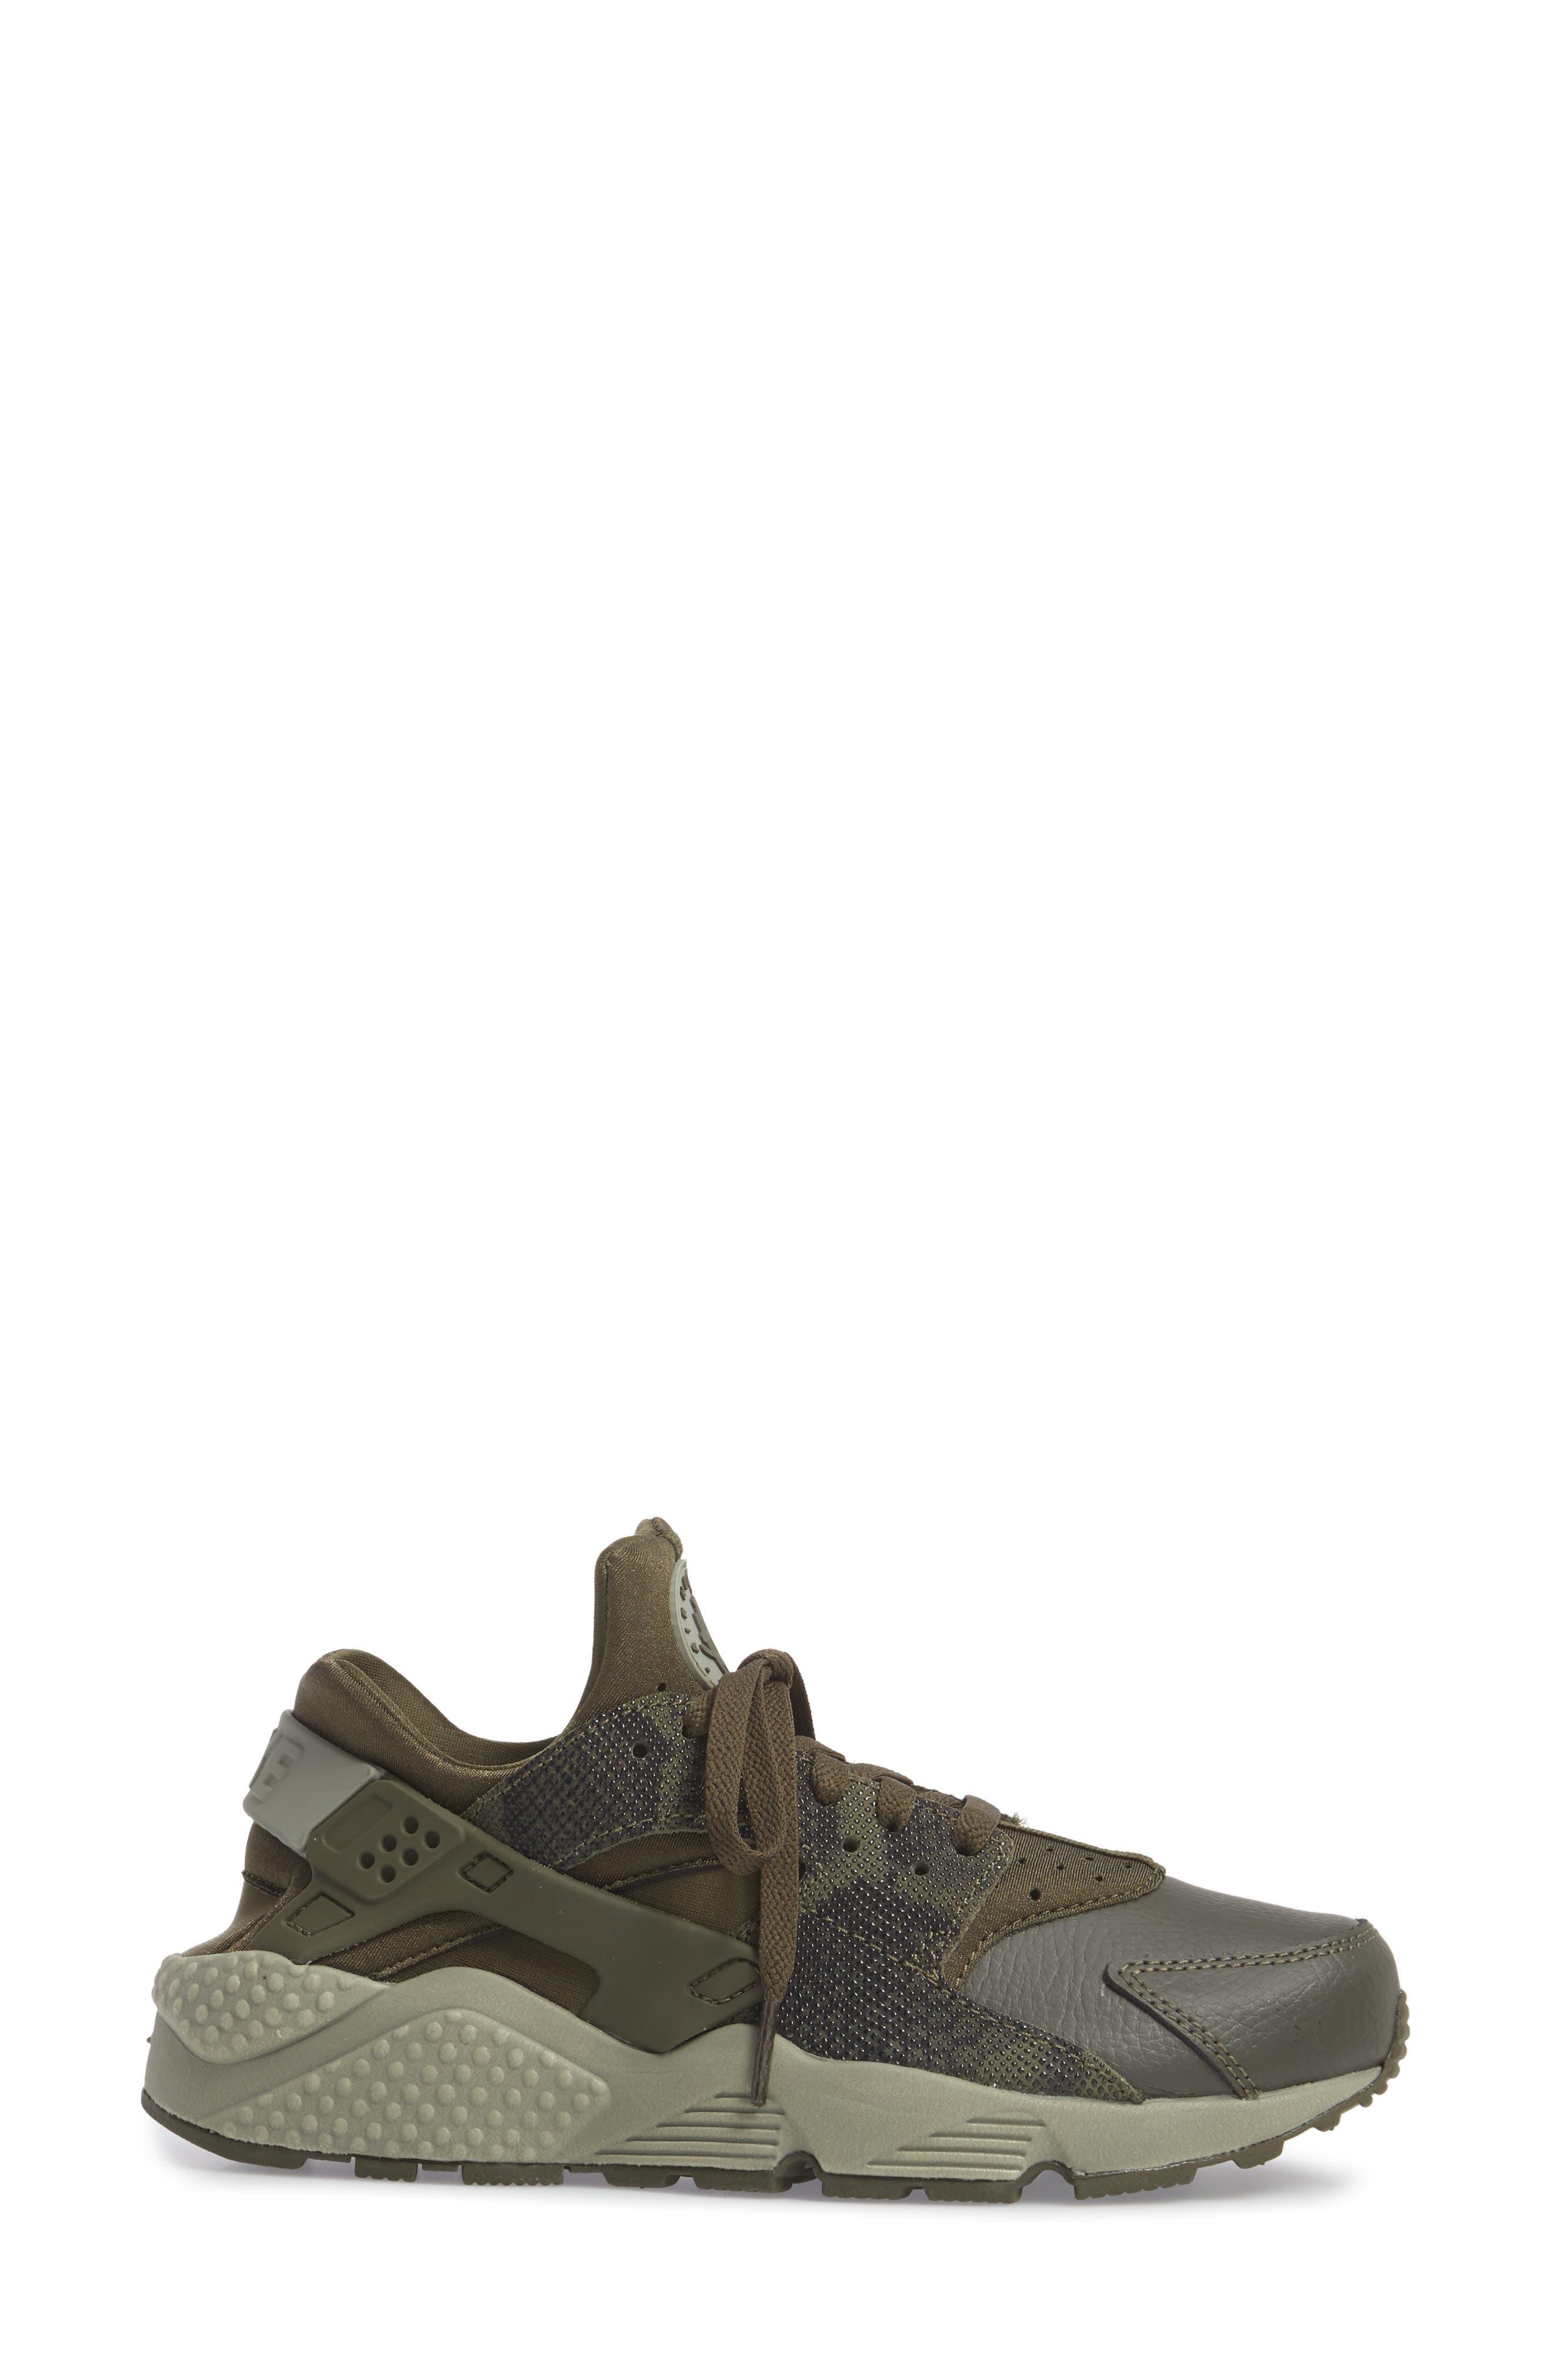 'Air Huarache' Sneaker,                             Alternate thumbnail 3, color,                             Cargo Khaki/ Cargo Khaki